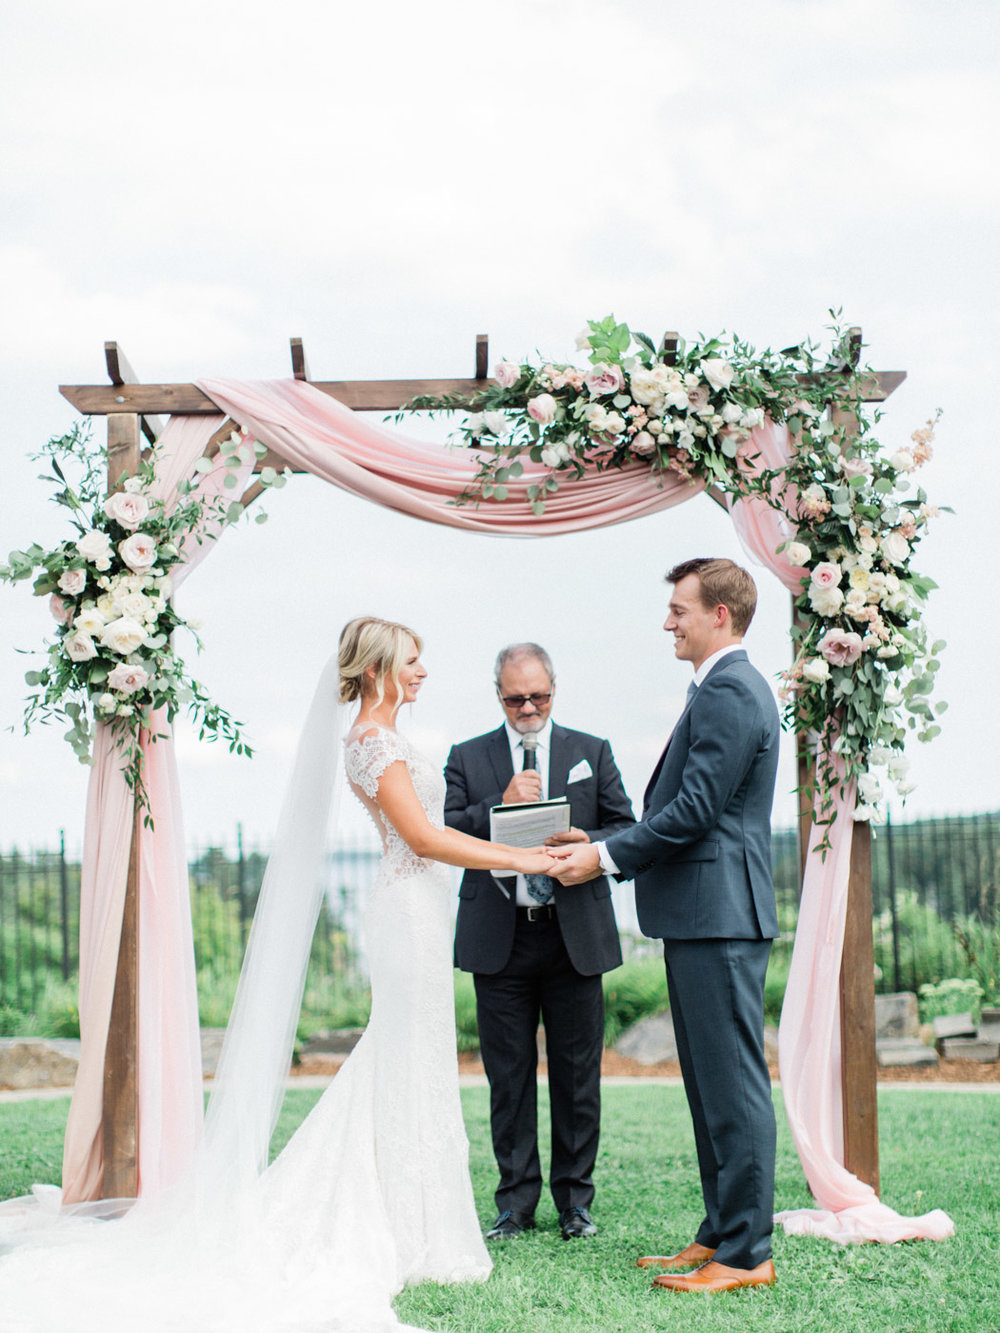 Toronto-Muskoka-wedding-photographer-summery-fun-documentary-the-marriott-rosseau80.jpg